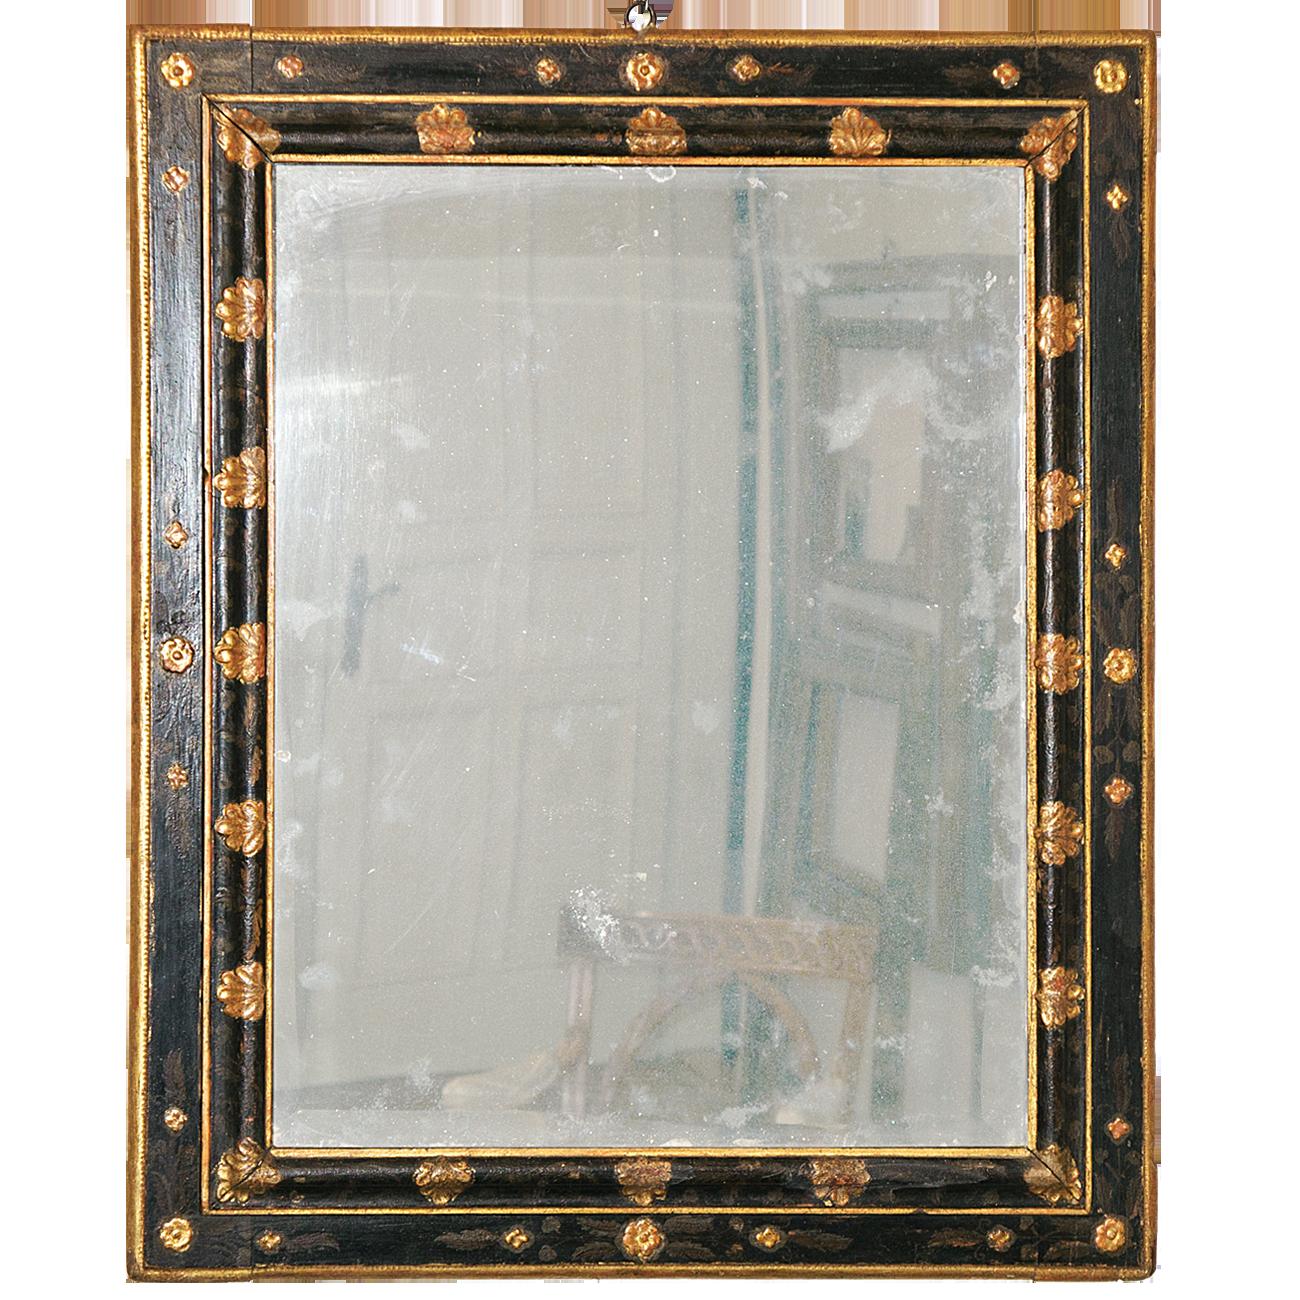 Produkte Archive - Antike Rahmen